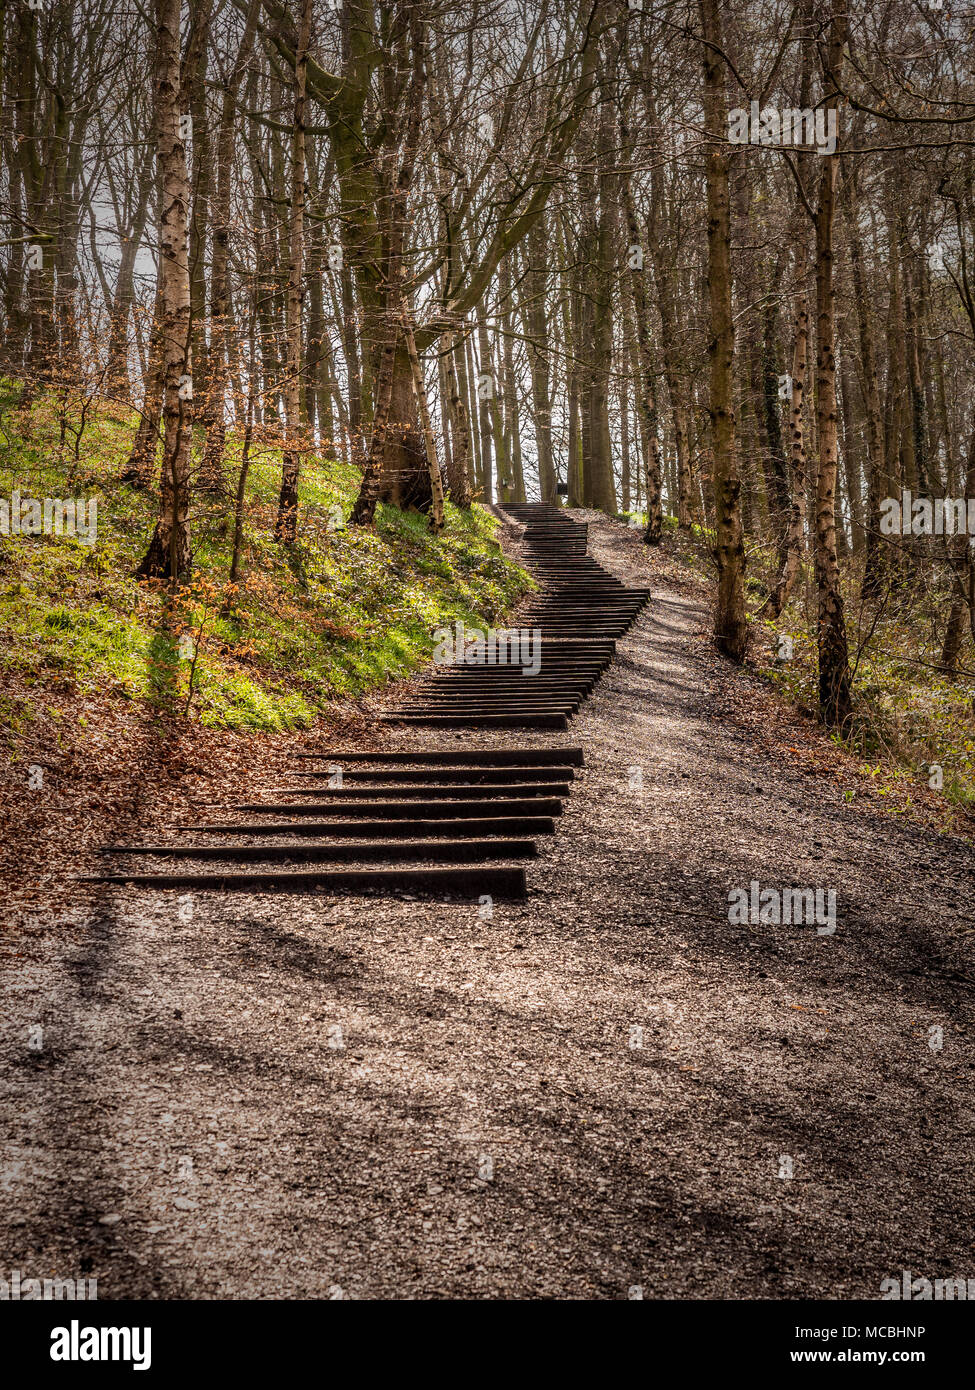 Seventy-one Steps installation by David Nash at the Yorkshire Sculpture Park, UK. - Stock Image